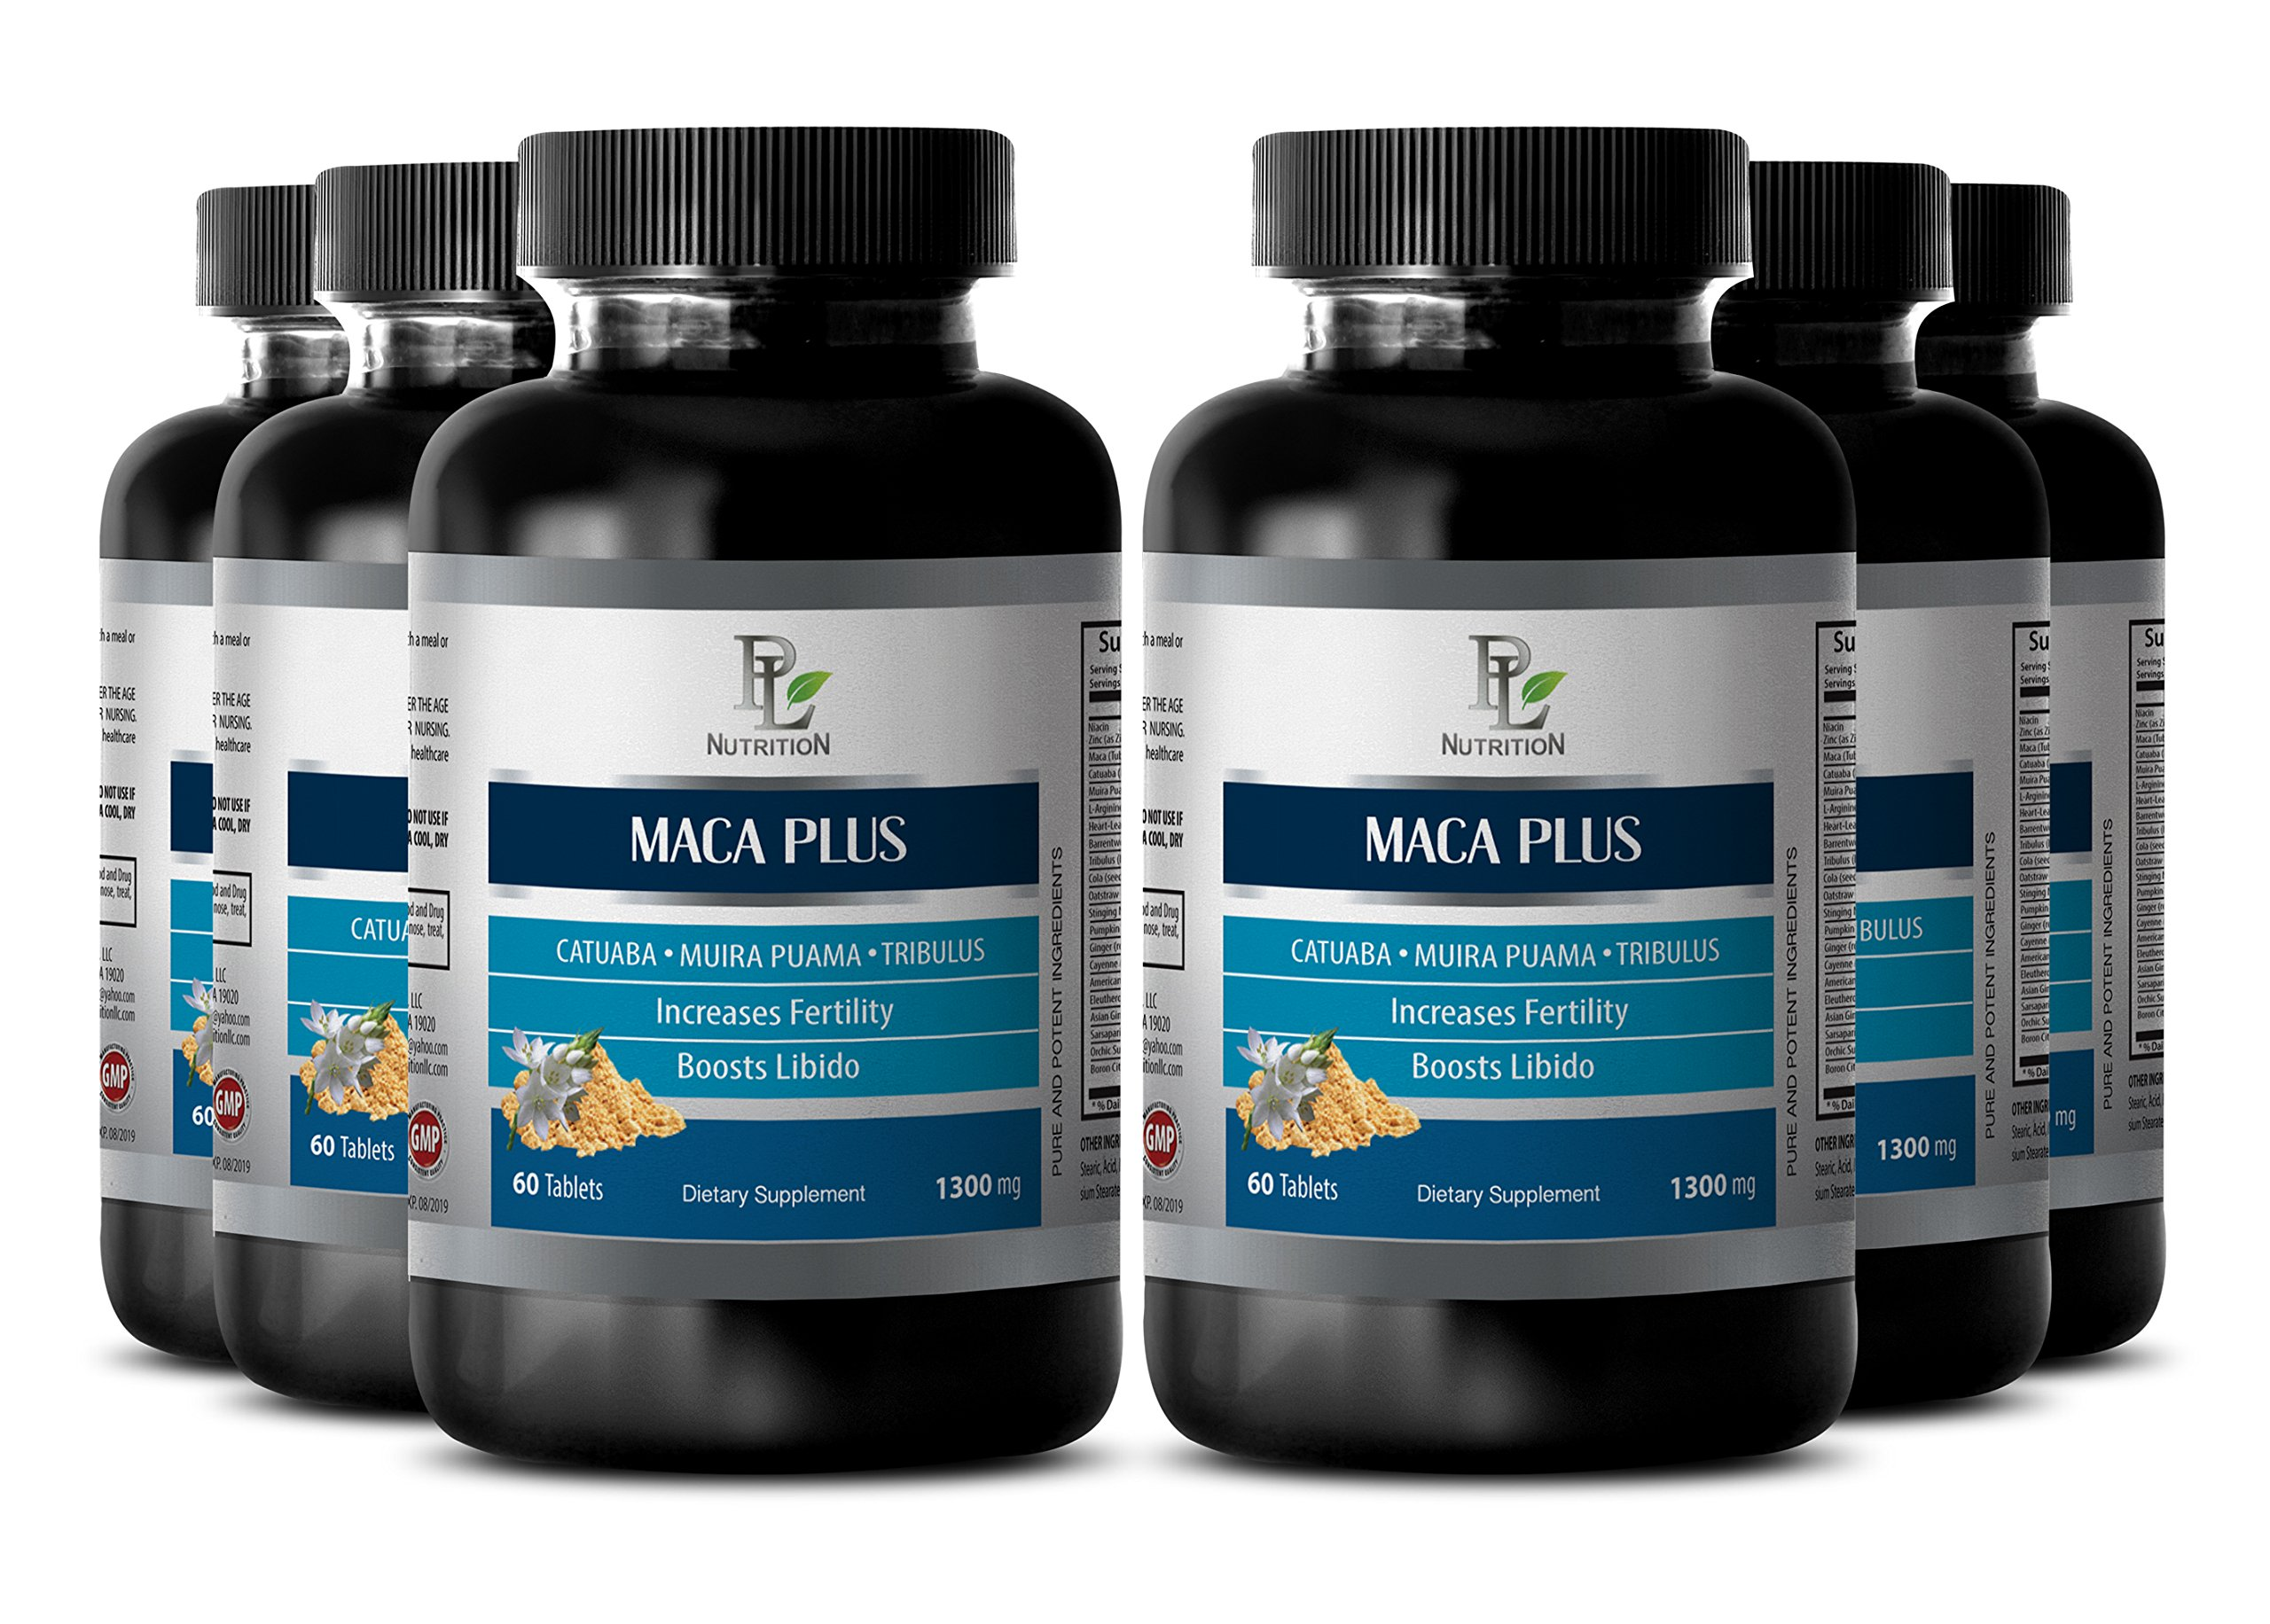 Natural sex pill for longer sex men - MACA PLUS - Maca root for weight gain - 6 Bottle 360 Tablets